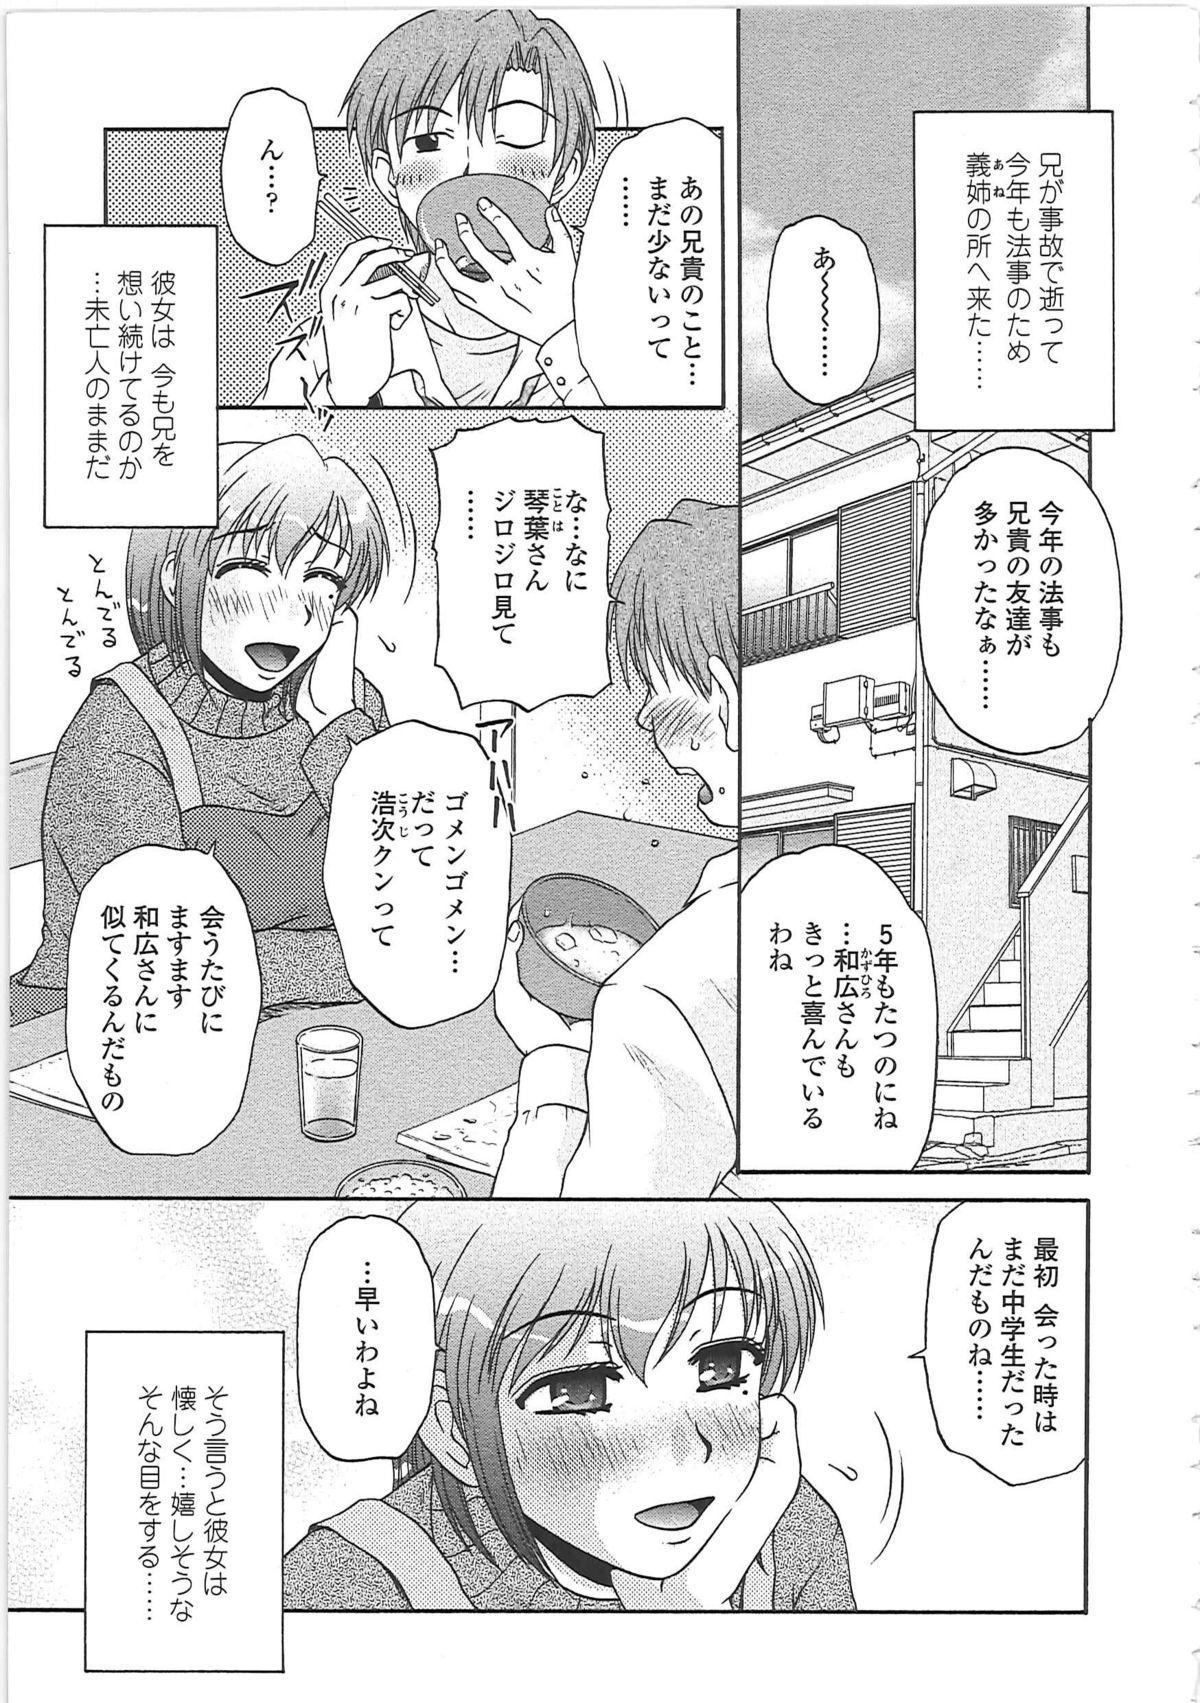 Nikuzuma Tsuushin - Erotic Wife Communication 47